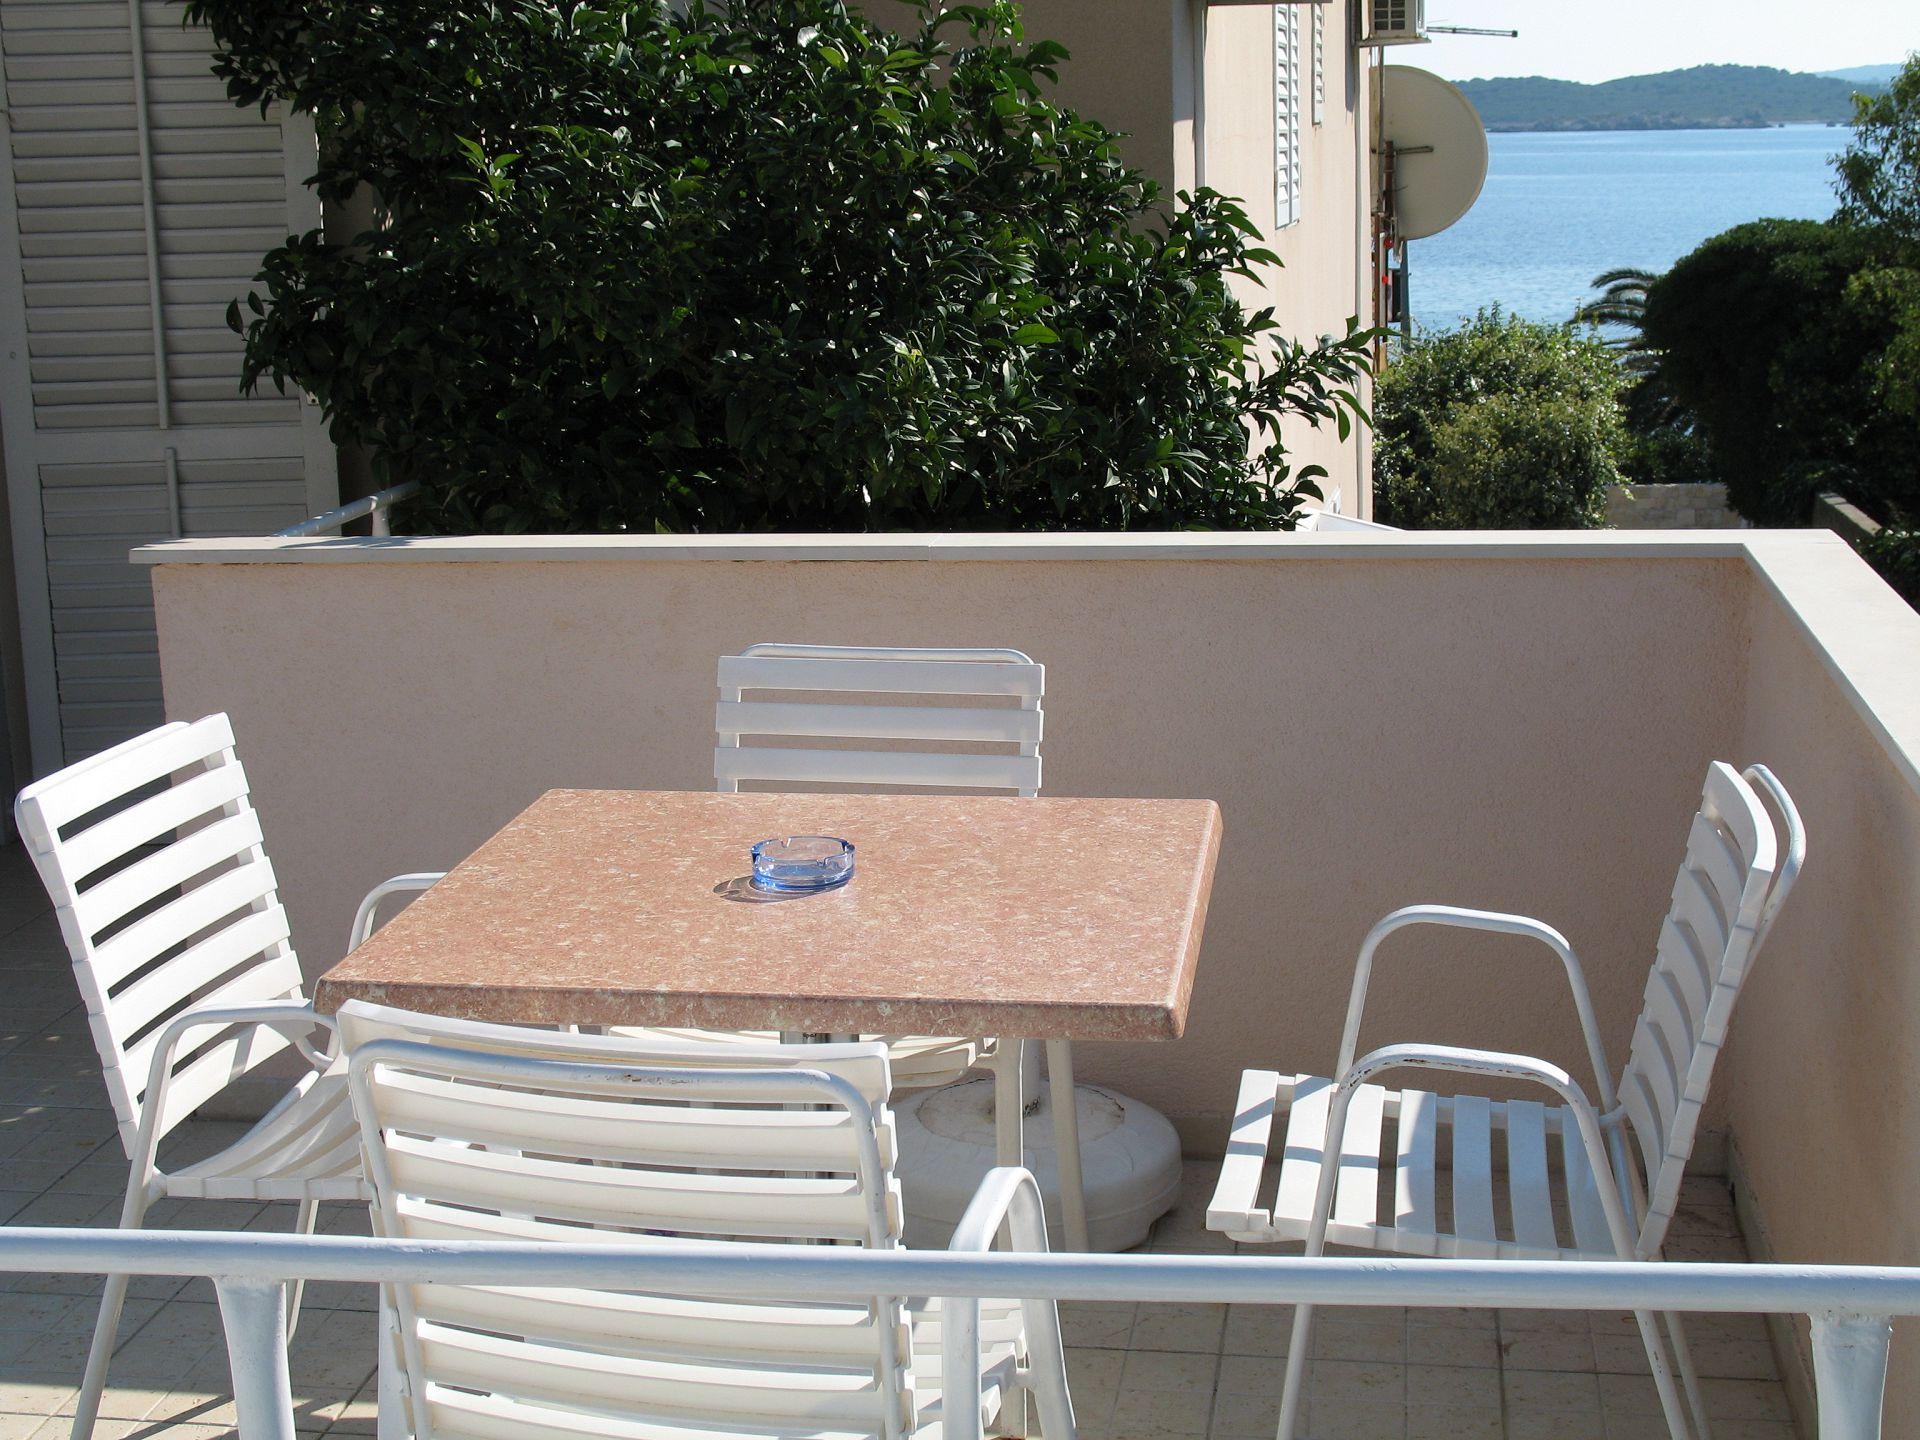 02017OREB - Orebic - Appartementen Kroatië - SA4(2+1): terras